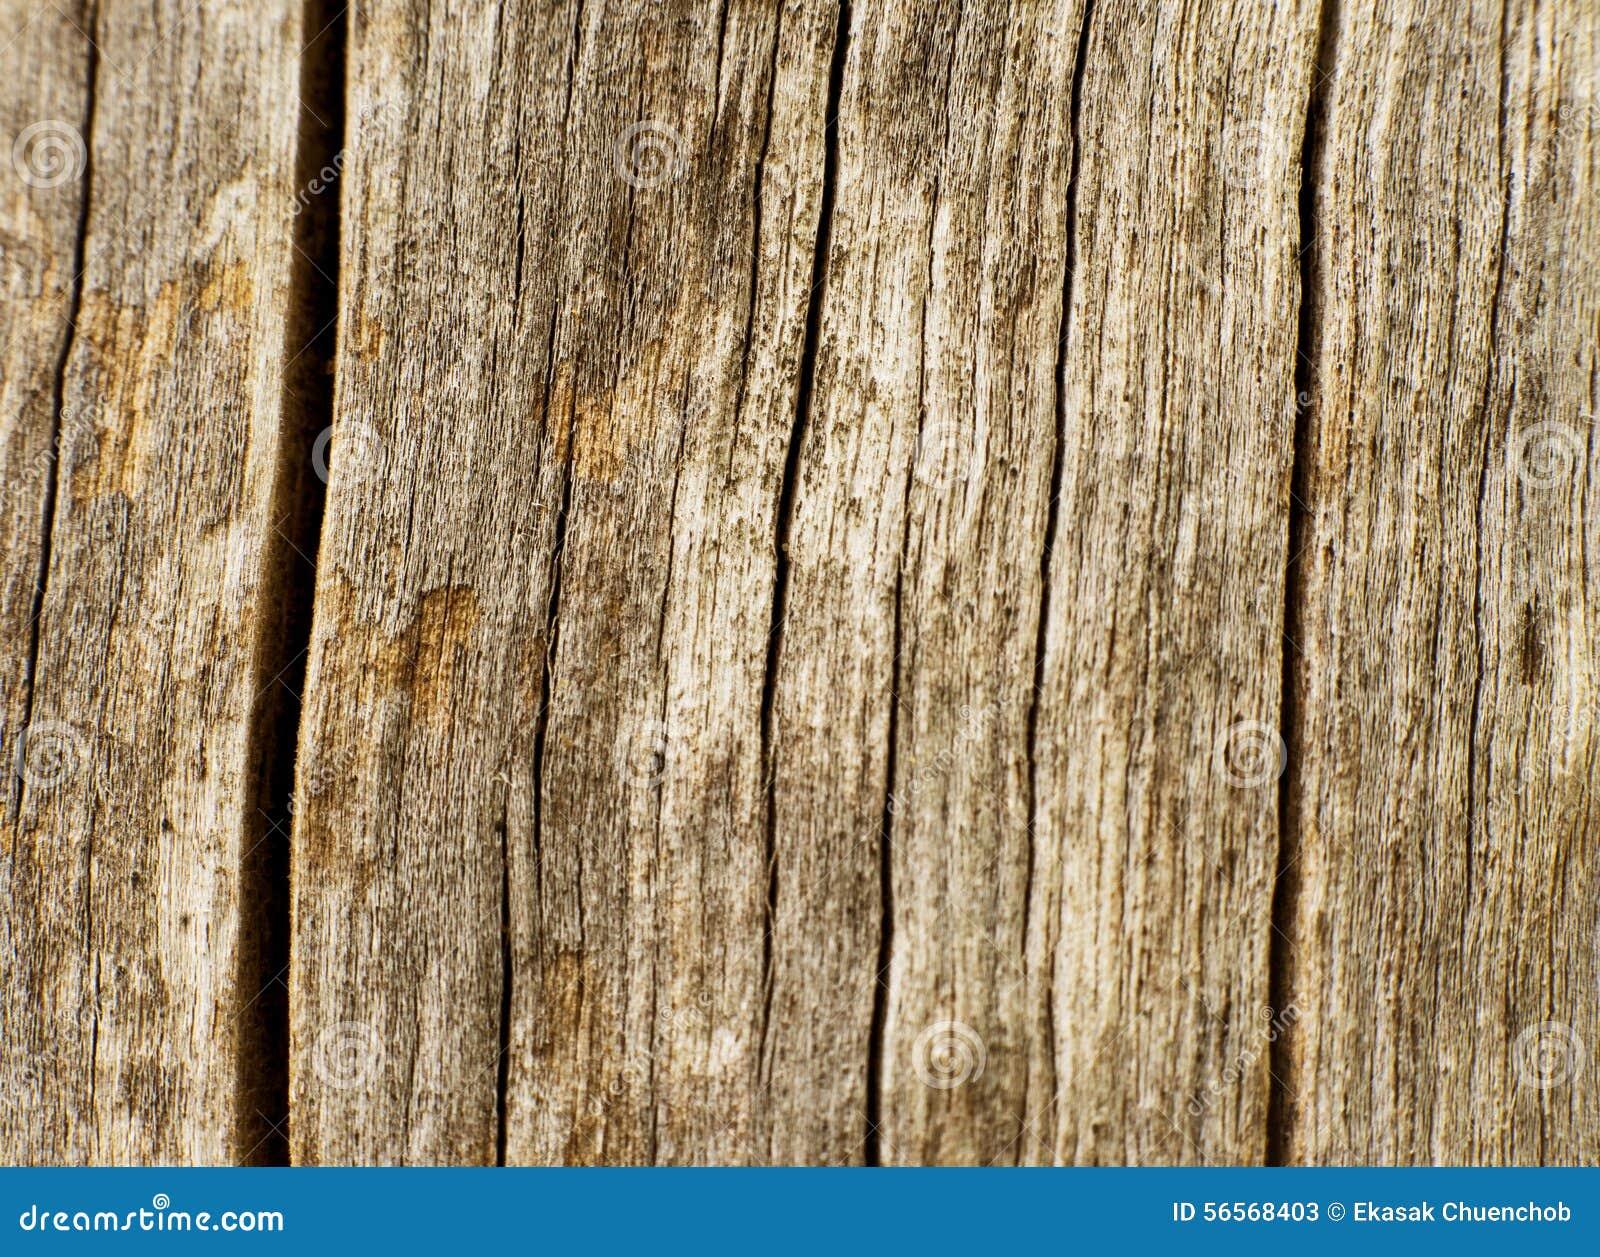 Download Ξύλινο taxture2 στοκ εικόνα. εικόνα από παλαιός, σύσταση - 56568403